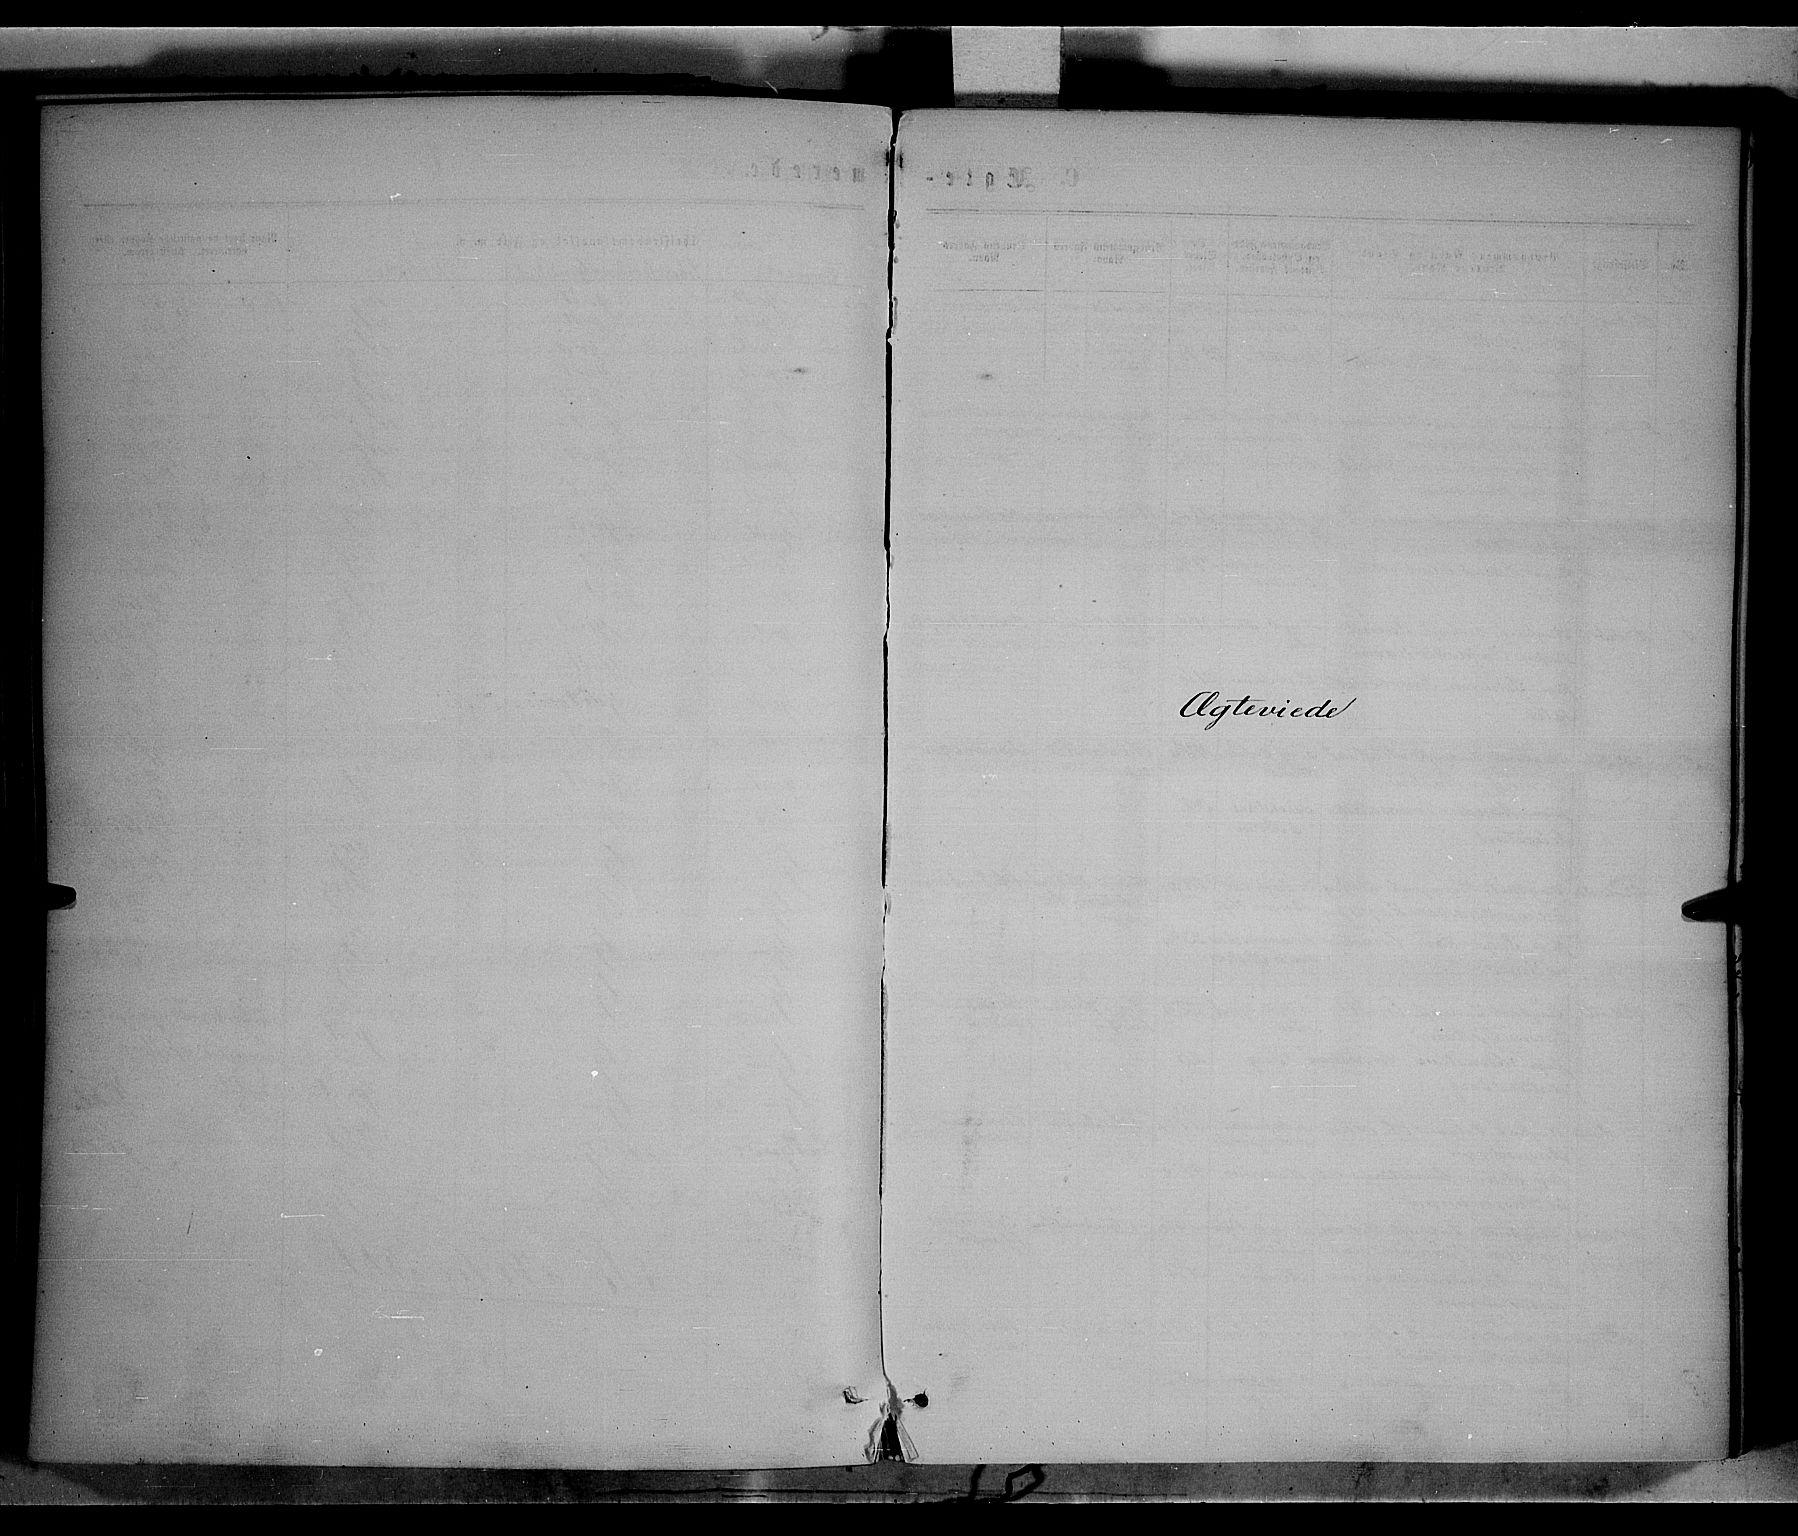 SAH, Vestre Toten prestekontor, H/Ha/Haa/L0008: Ministerialbok nr. 8, 1870-1877